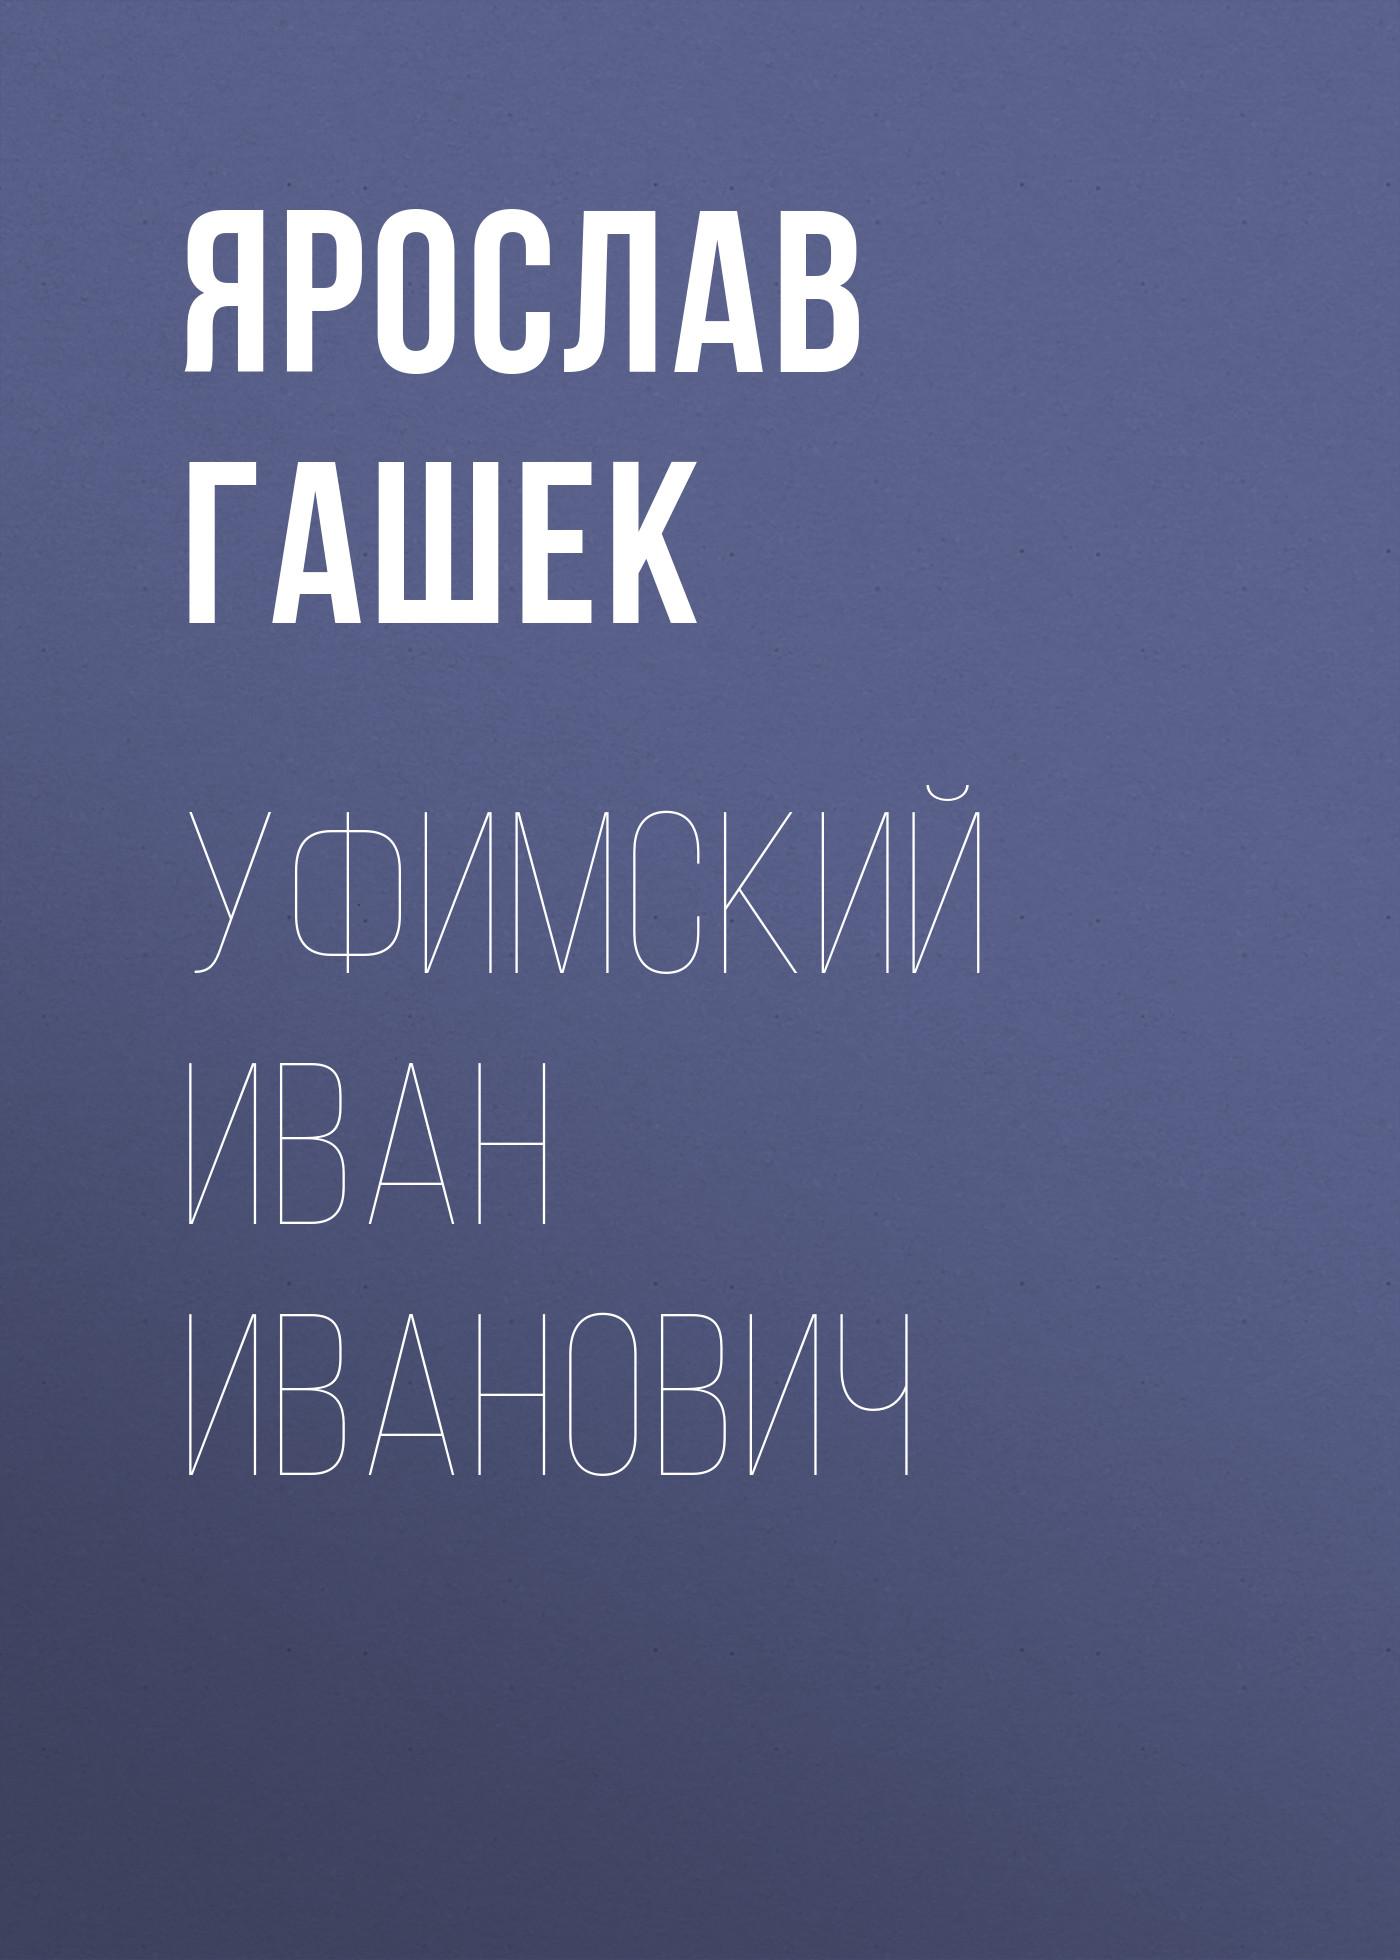 ufimskiy ivan ivanovich